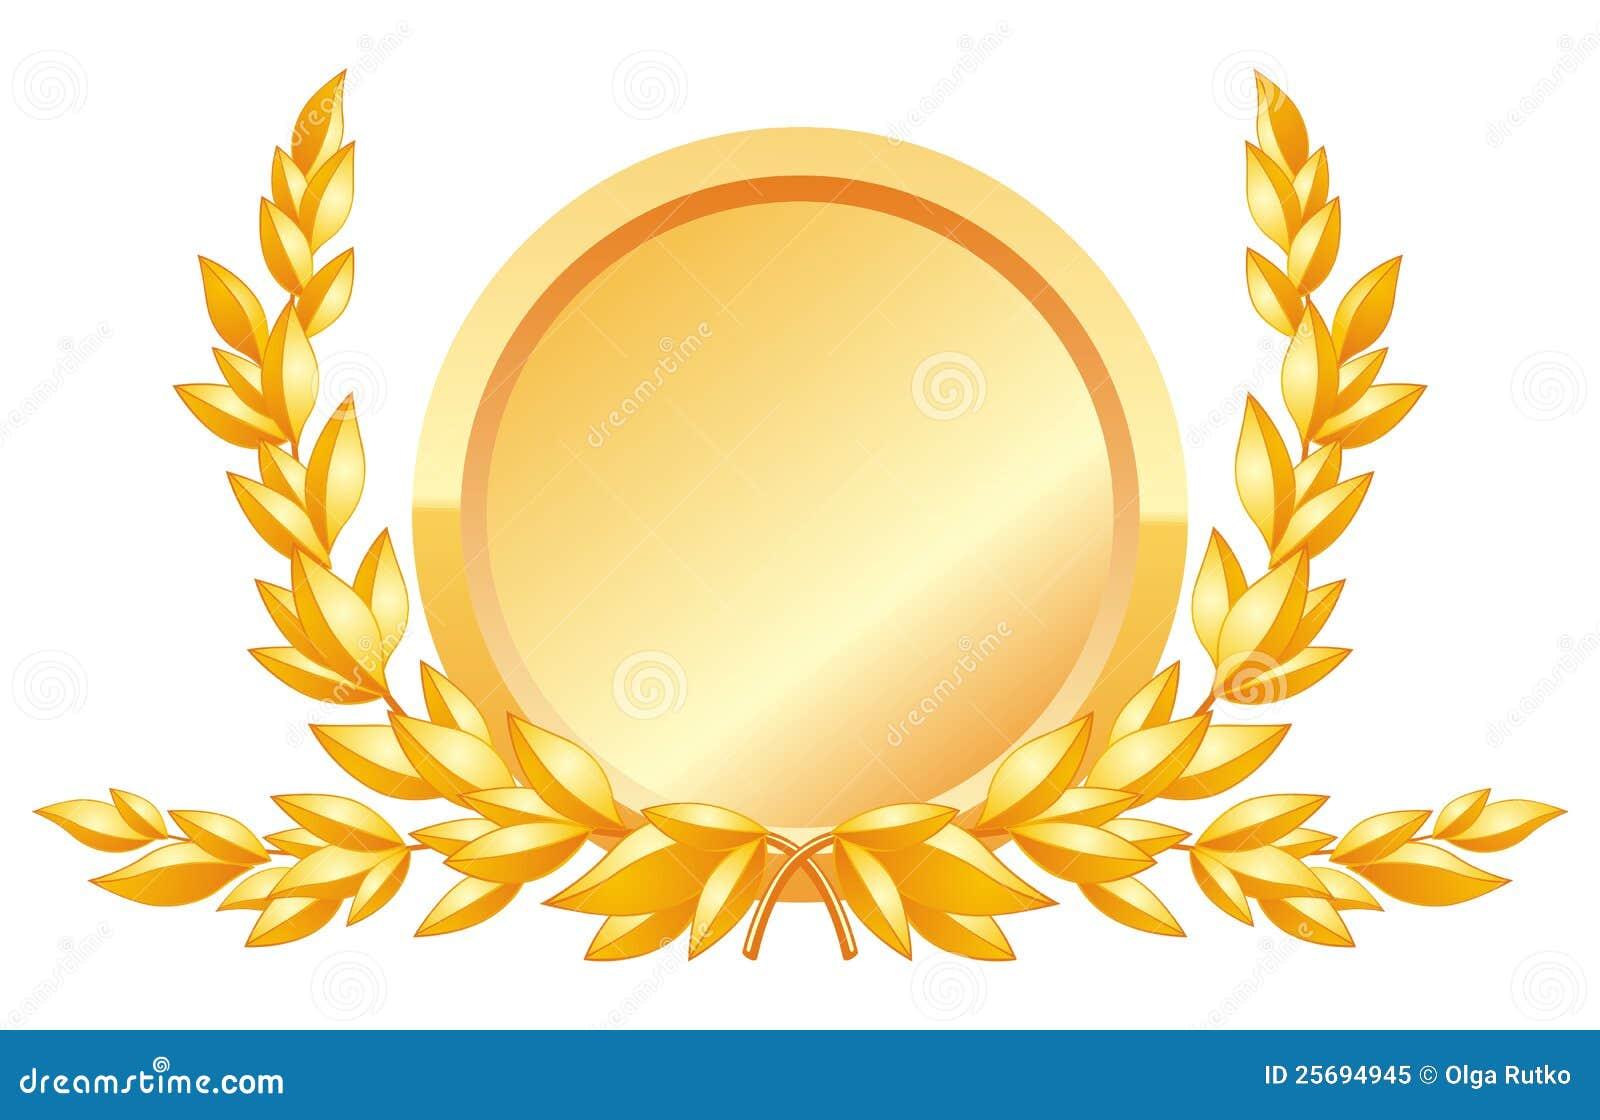 Award decoration stock vector illustration of branch for Award decoration